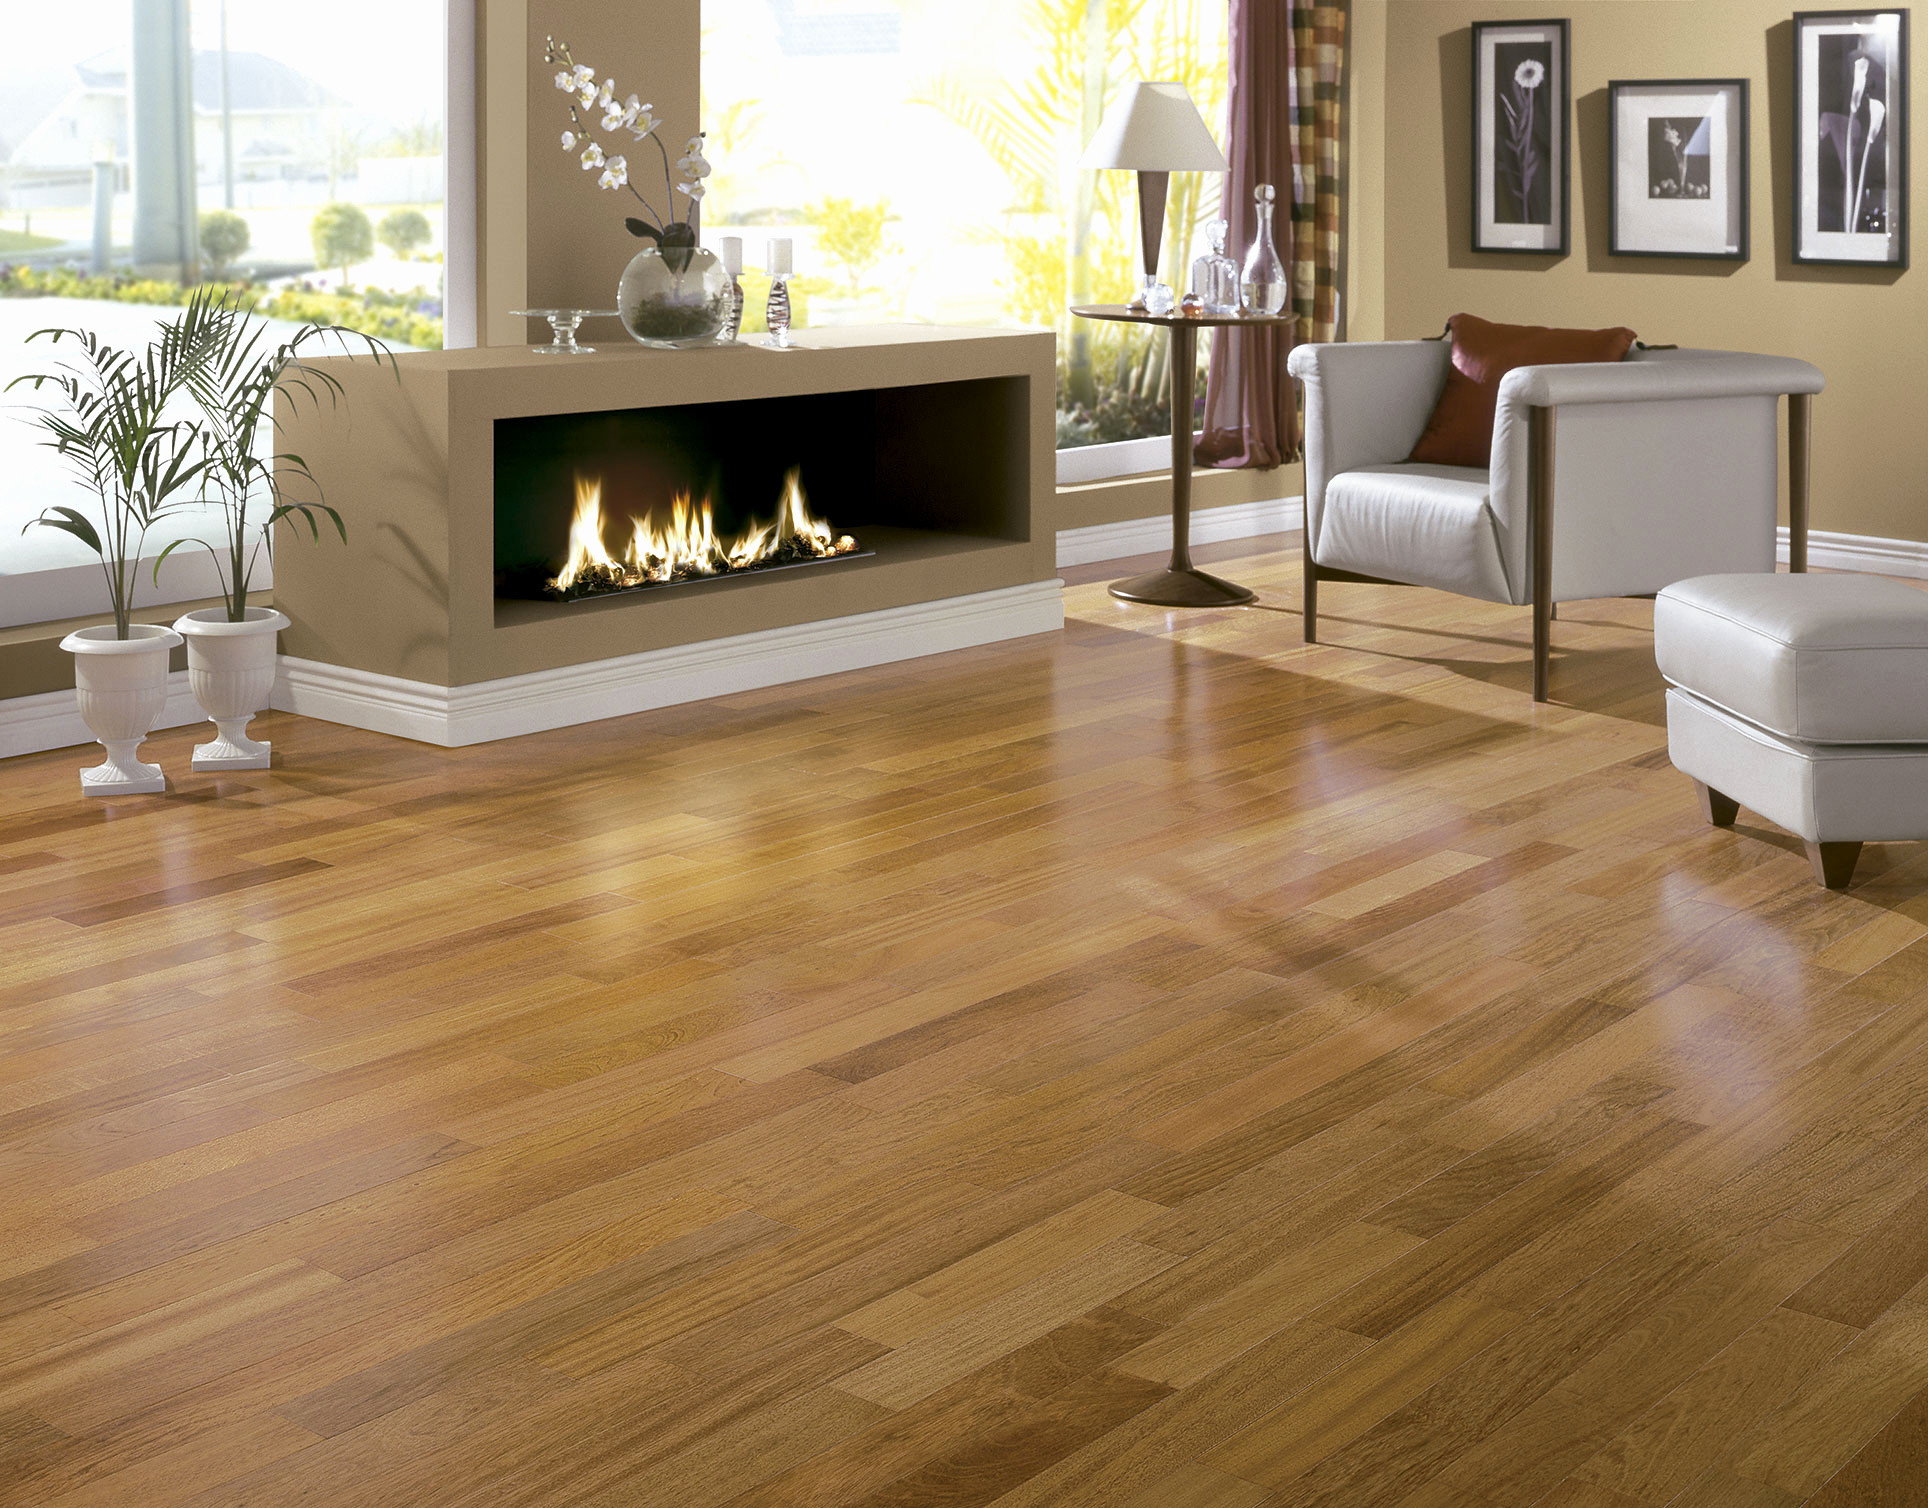 wide plank solid hardwood flooring of wide plank wood flooring beautiful hardwood flooring including inside wide plank wood flooring beautiful engaging discount hardwood flooring 5 where to buy inspirational 0d wide plank wood flooring